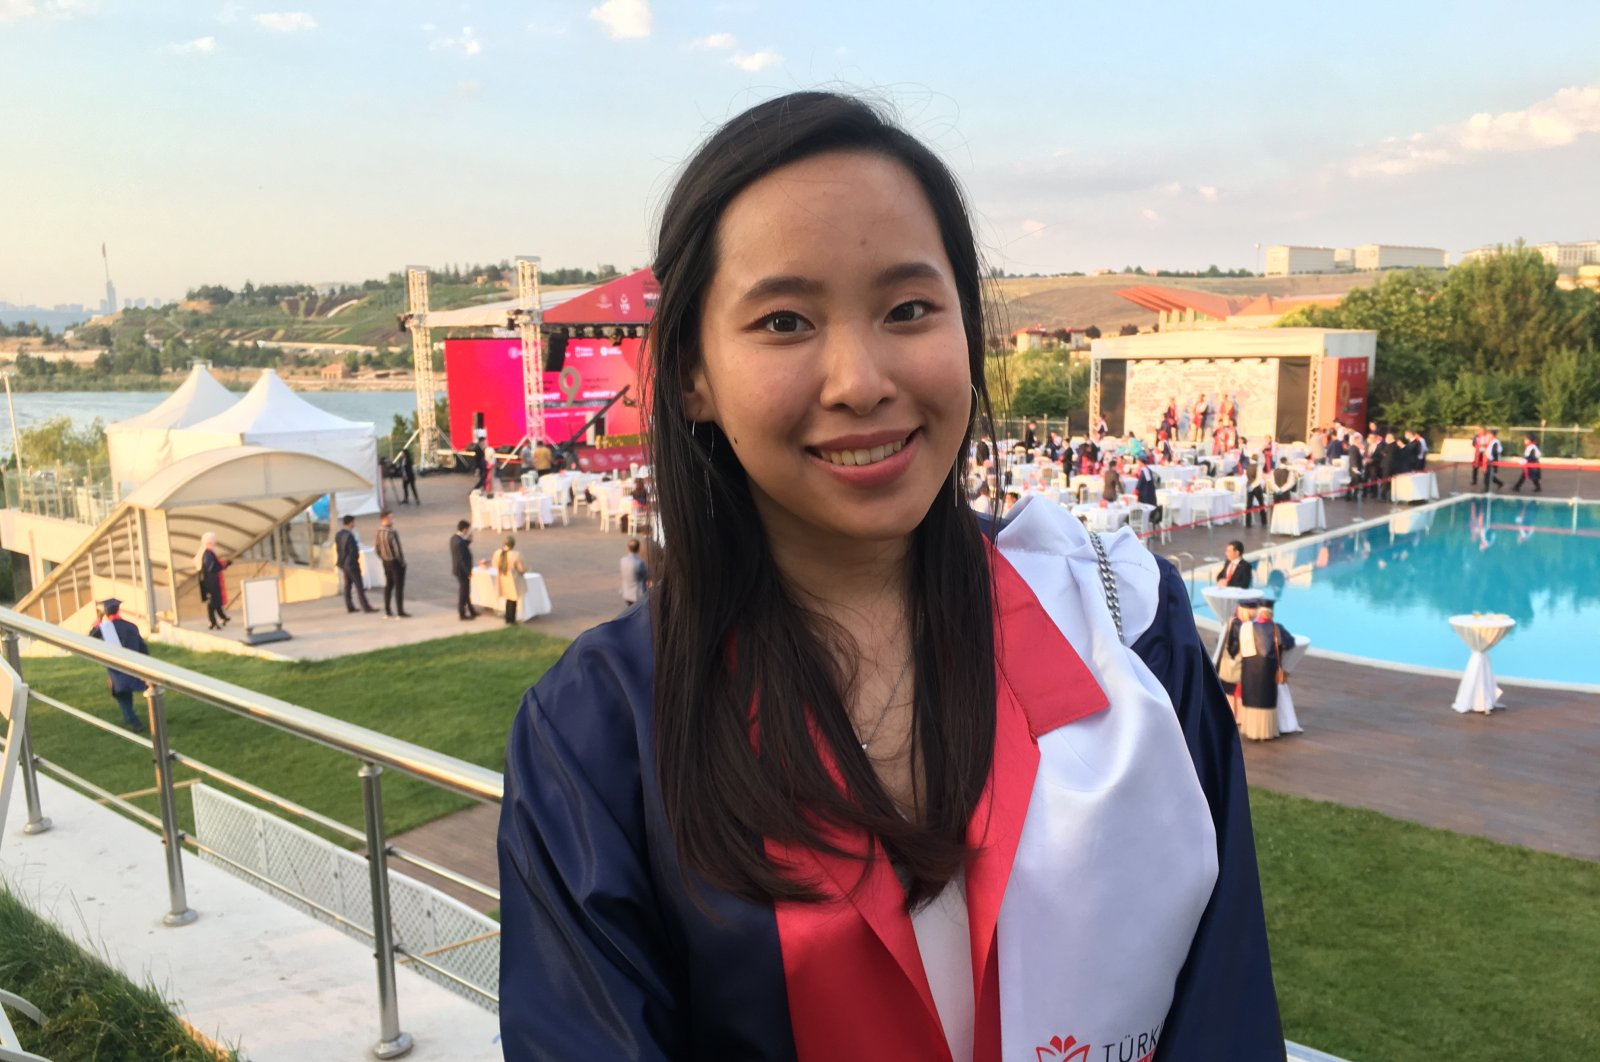 Indonesian student Arleen Emerson poses at the graduation ceremony, in the capital Ankara, Turkey, July 28, 2020. (AA Photo)